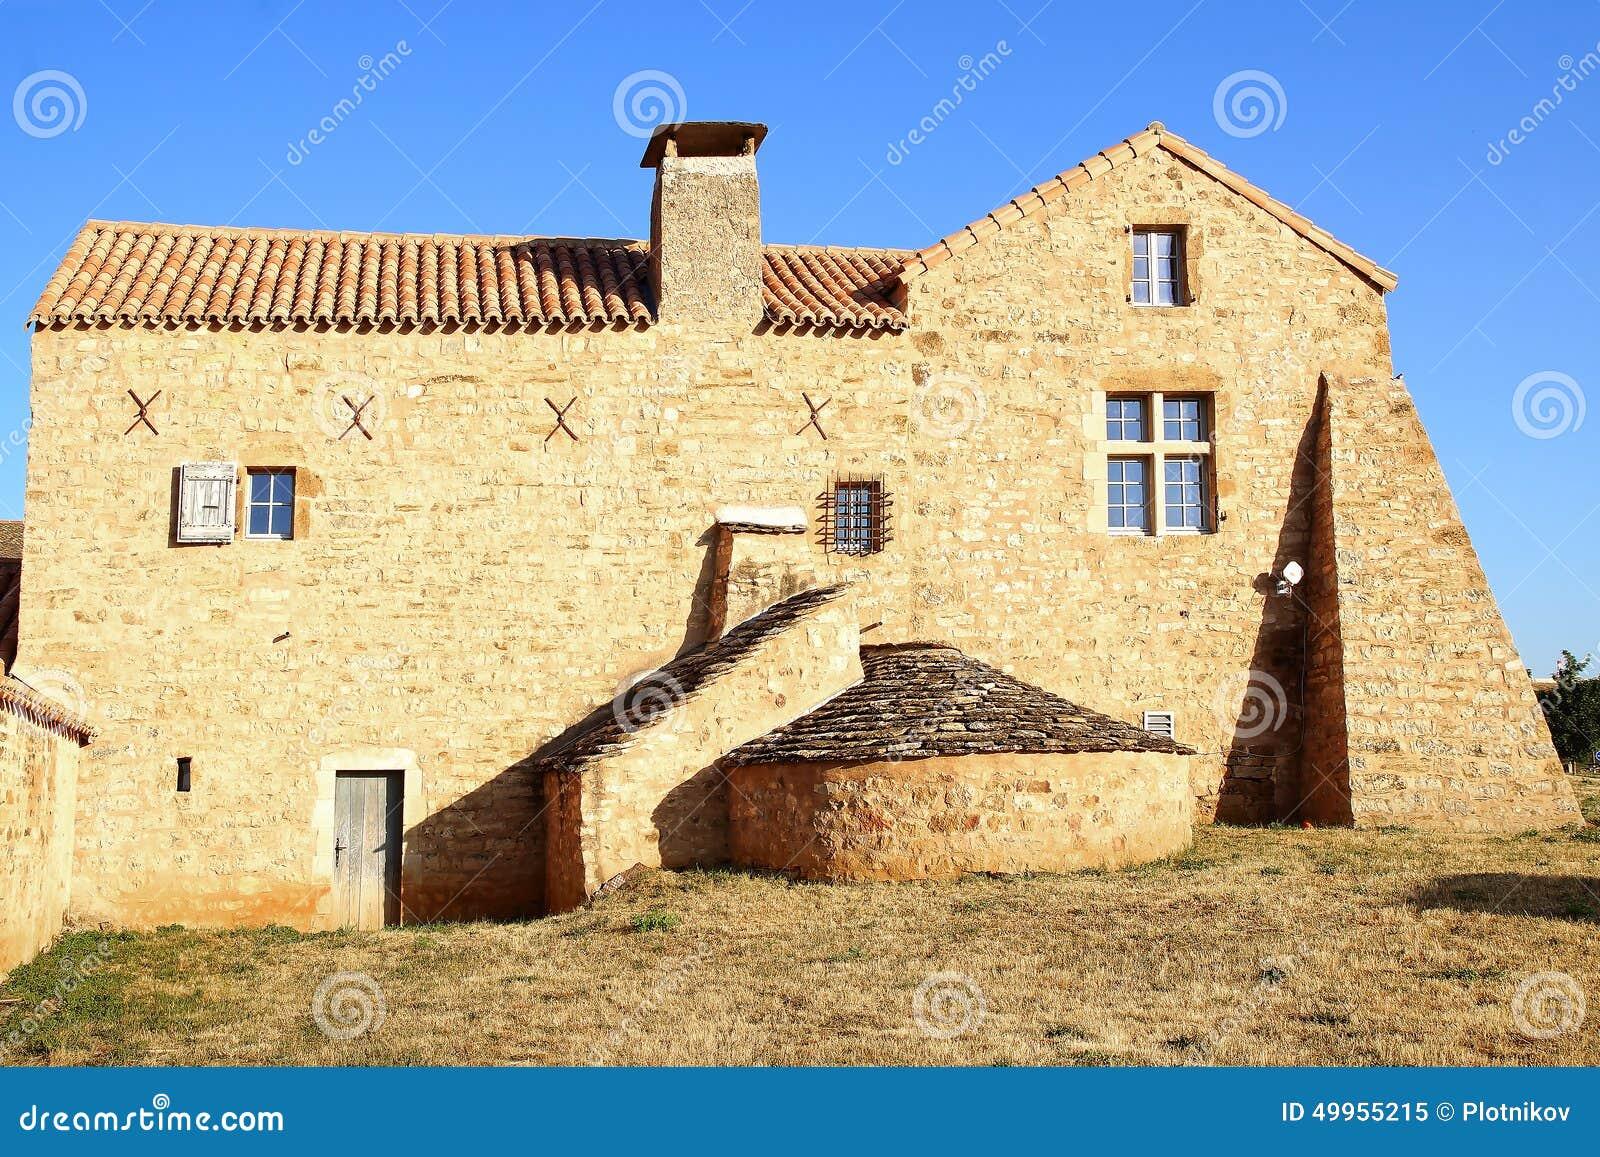 vieille maison fran aise traditionnelle photo stock image 49955215. Black Bedroom Furniture Sets. Home Design Ideas